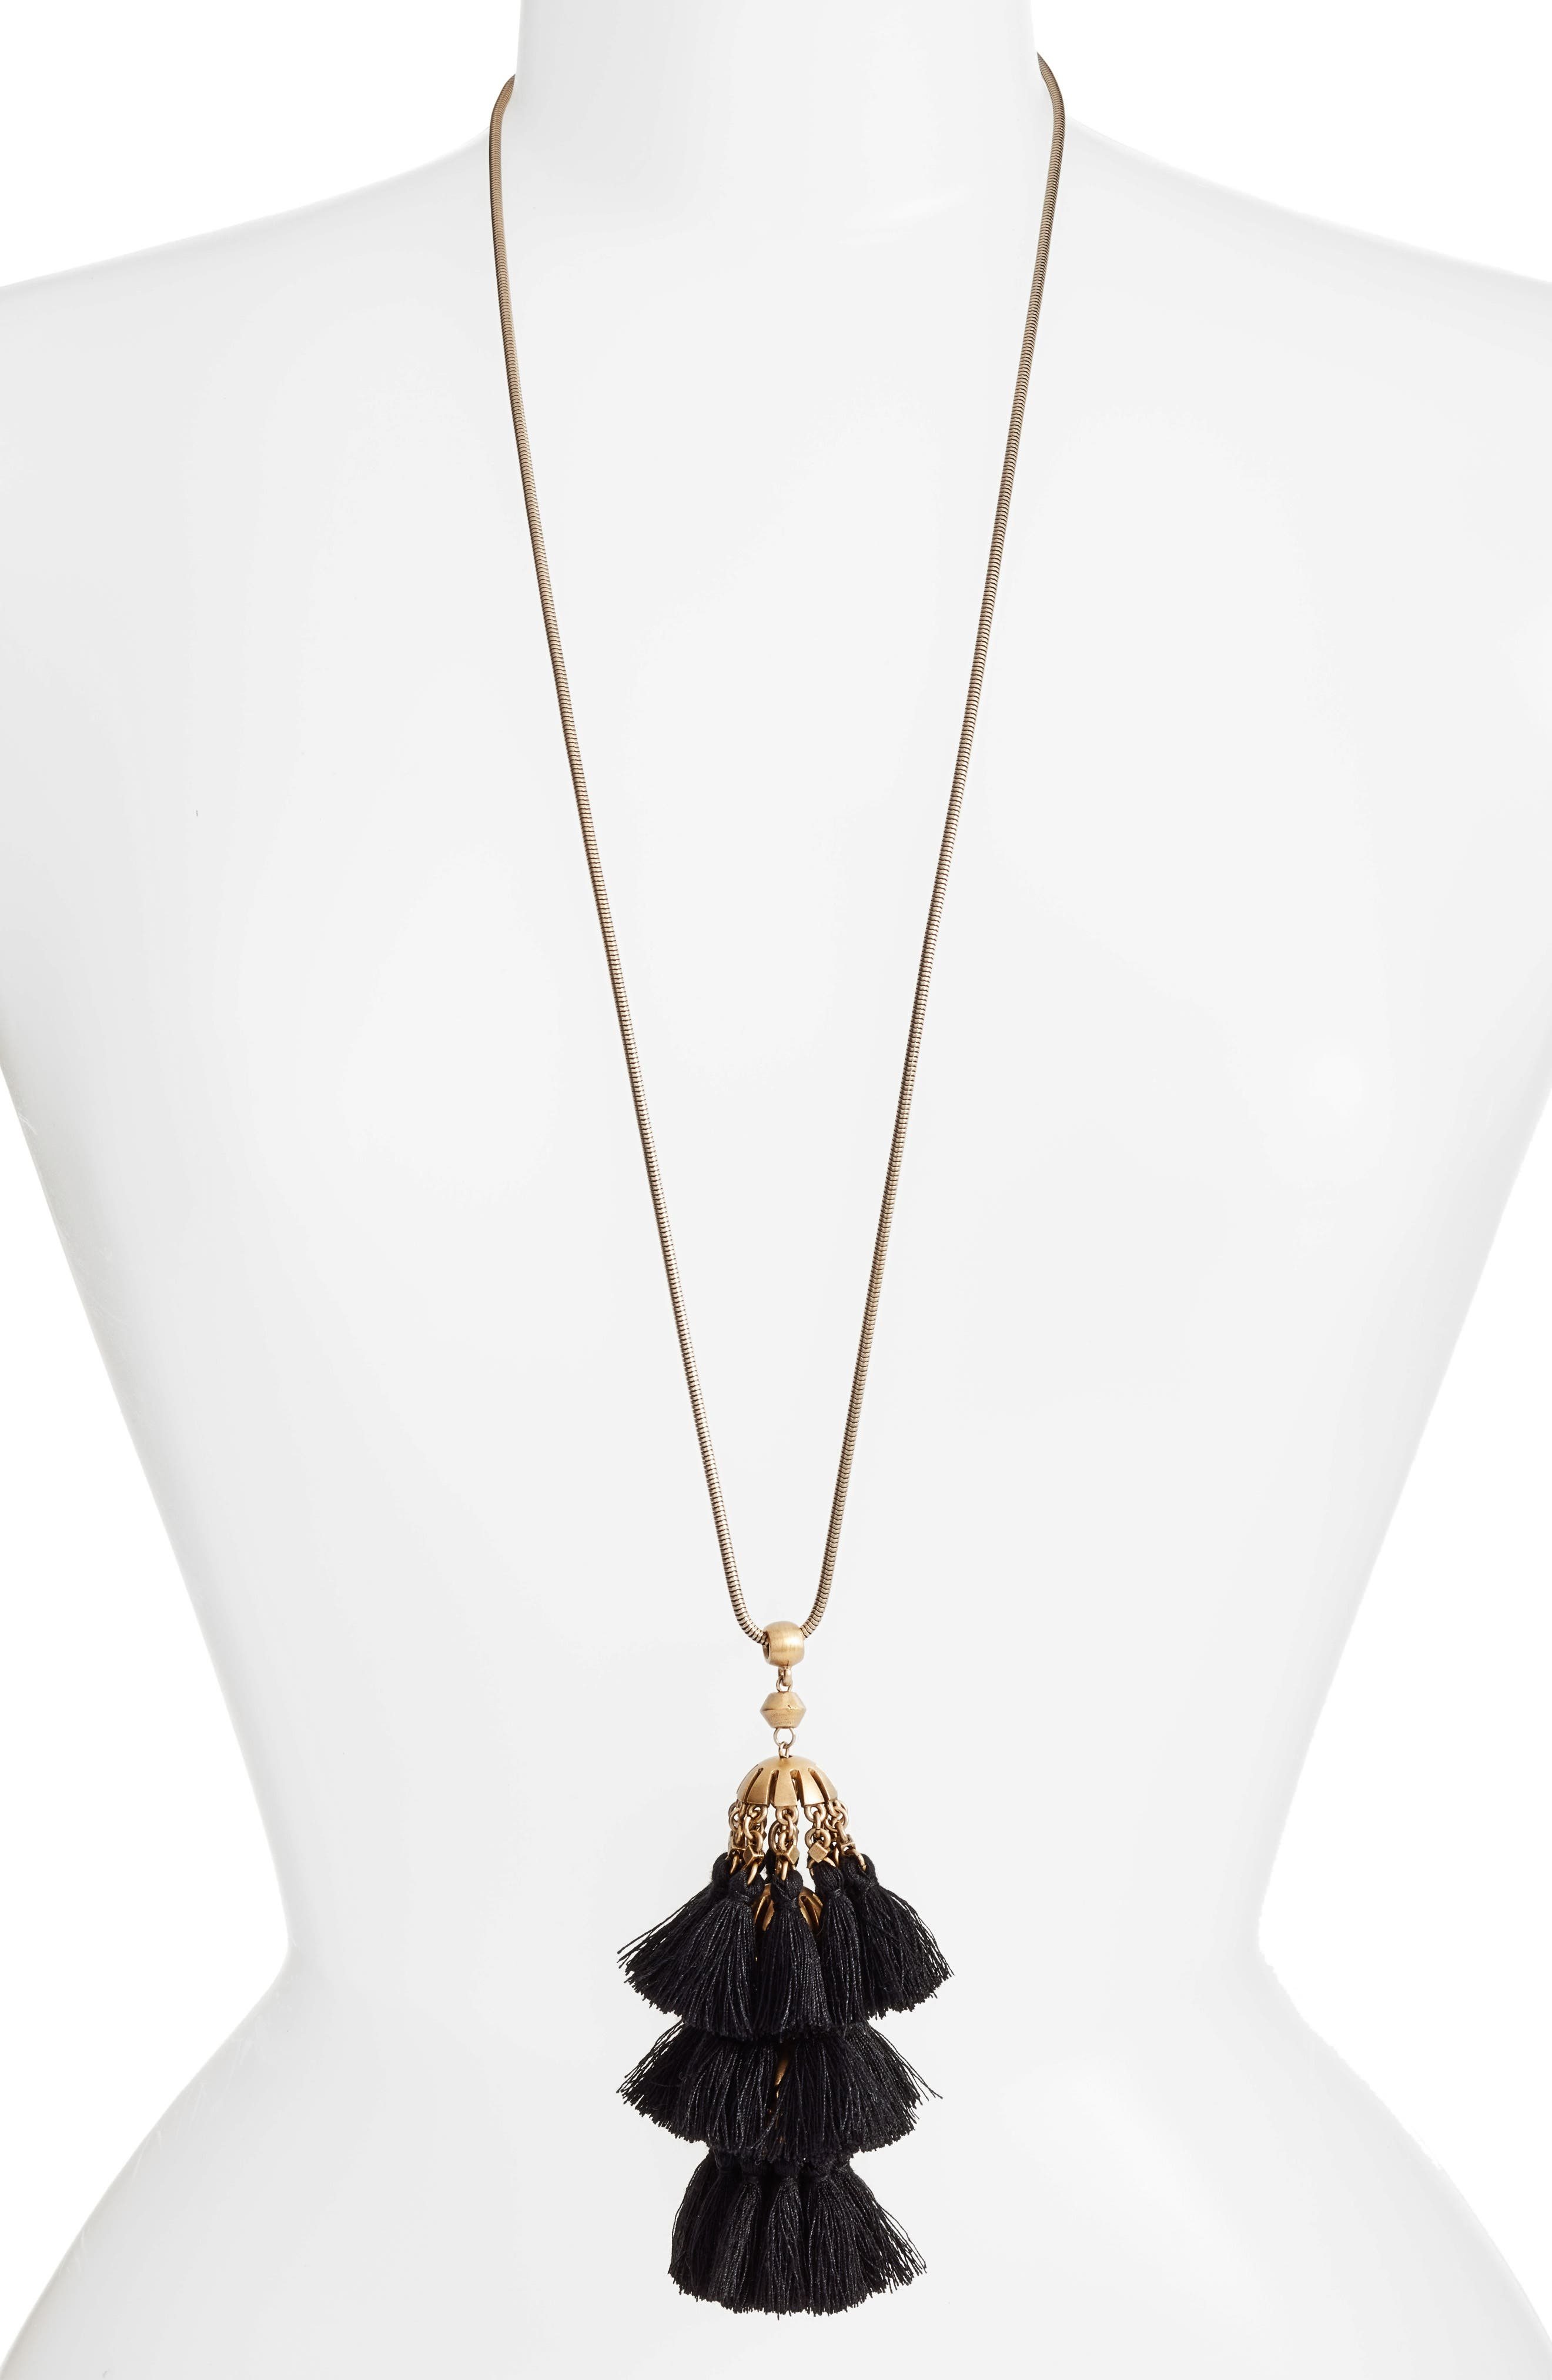 Loren Hope Audrey Tassel Pendant Necklace